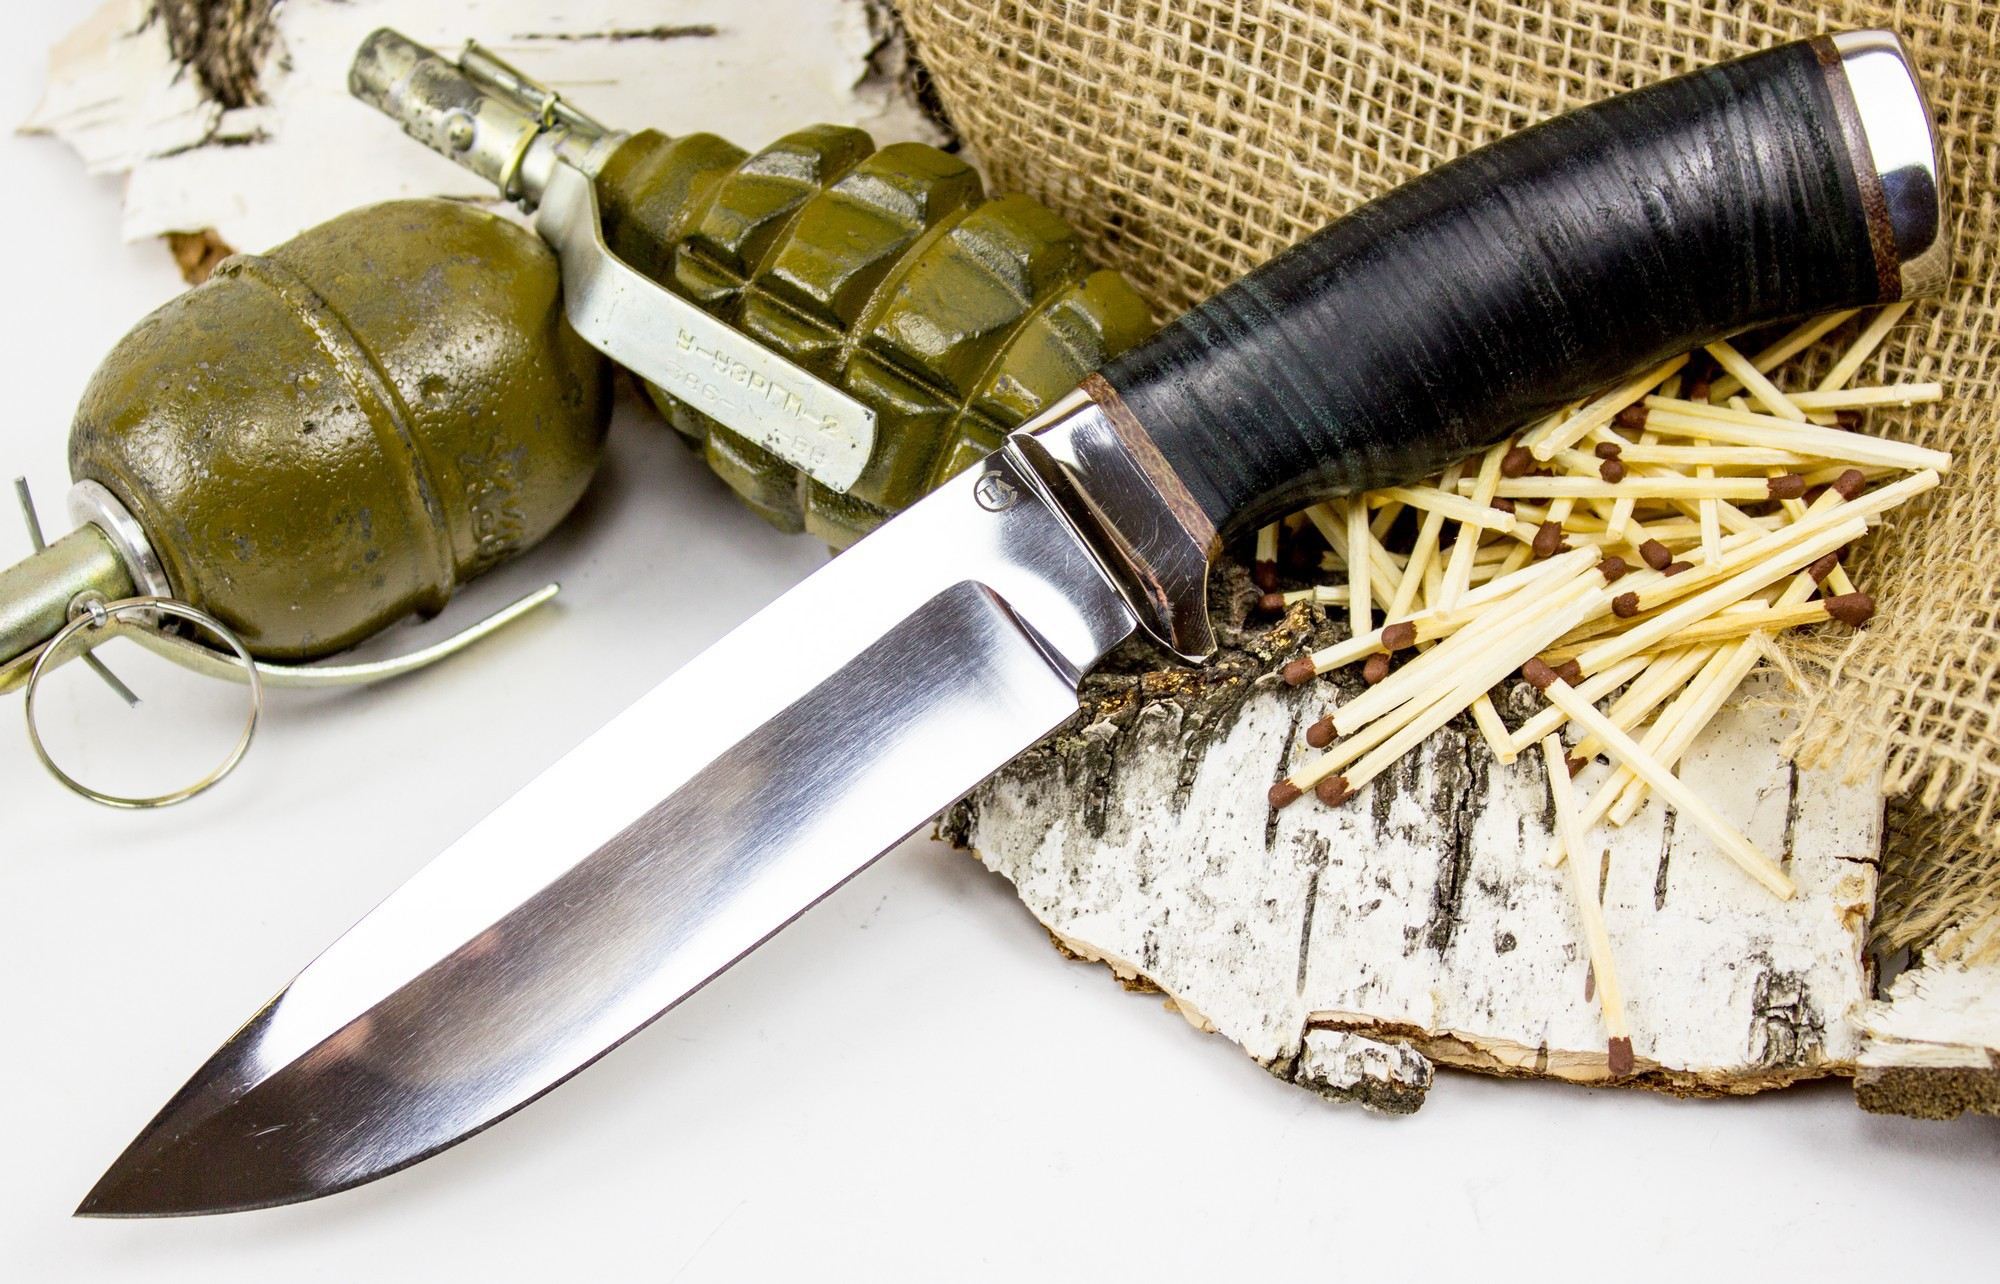 Фото 4 - Нож Кубанец, сталь 95х18, кожа от Титов и Солдатова